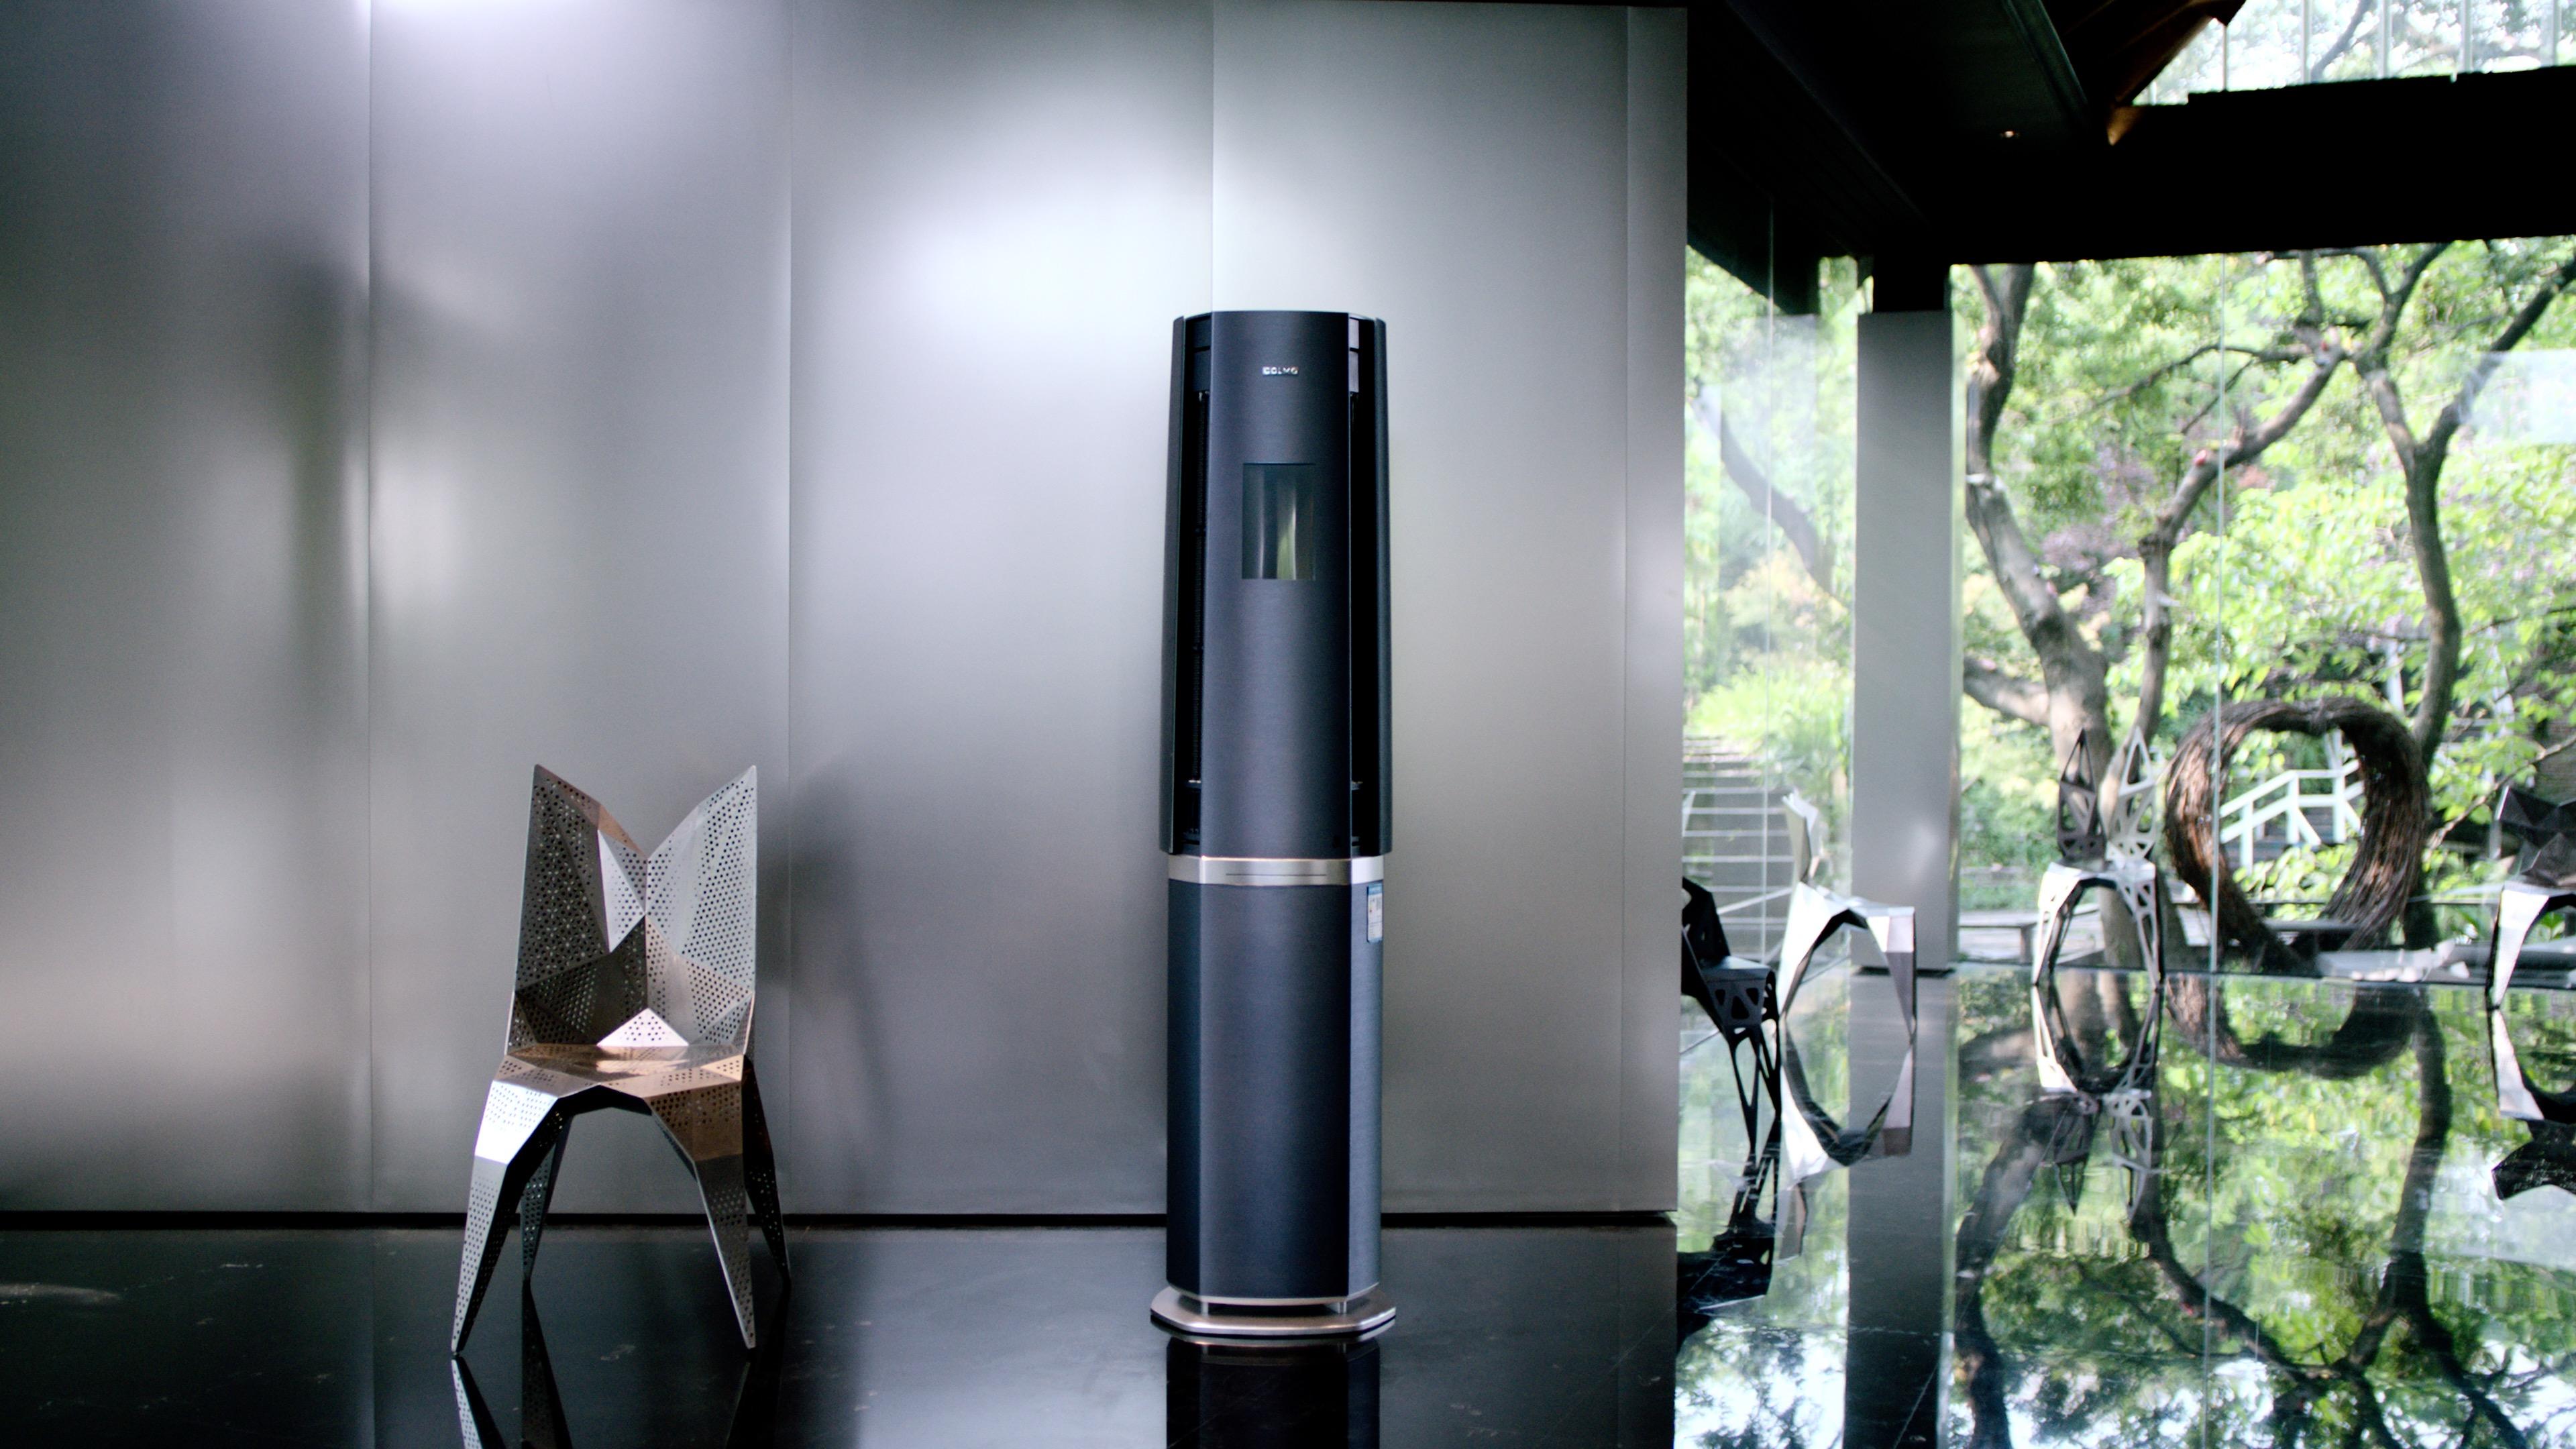 COLMO对话张周捷:理享生活就是设计融合科技的共创